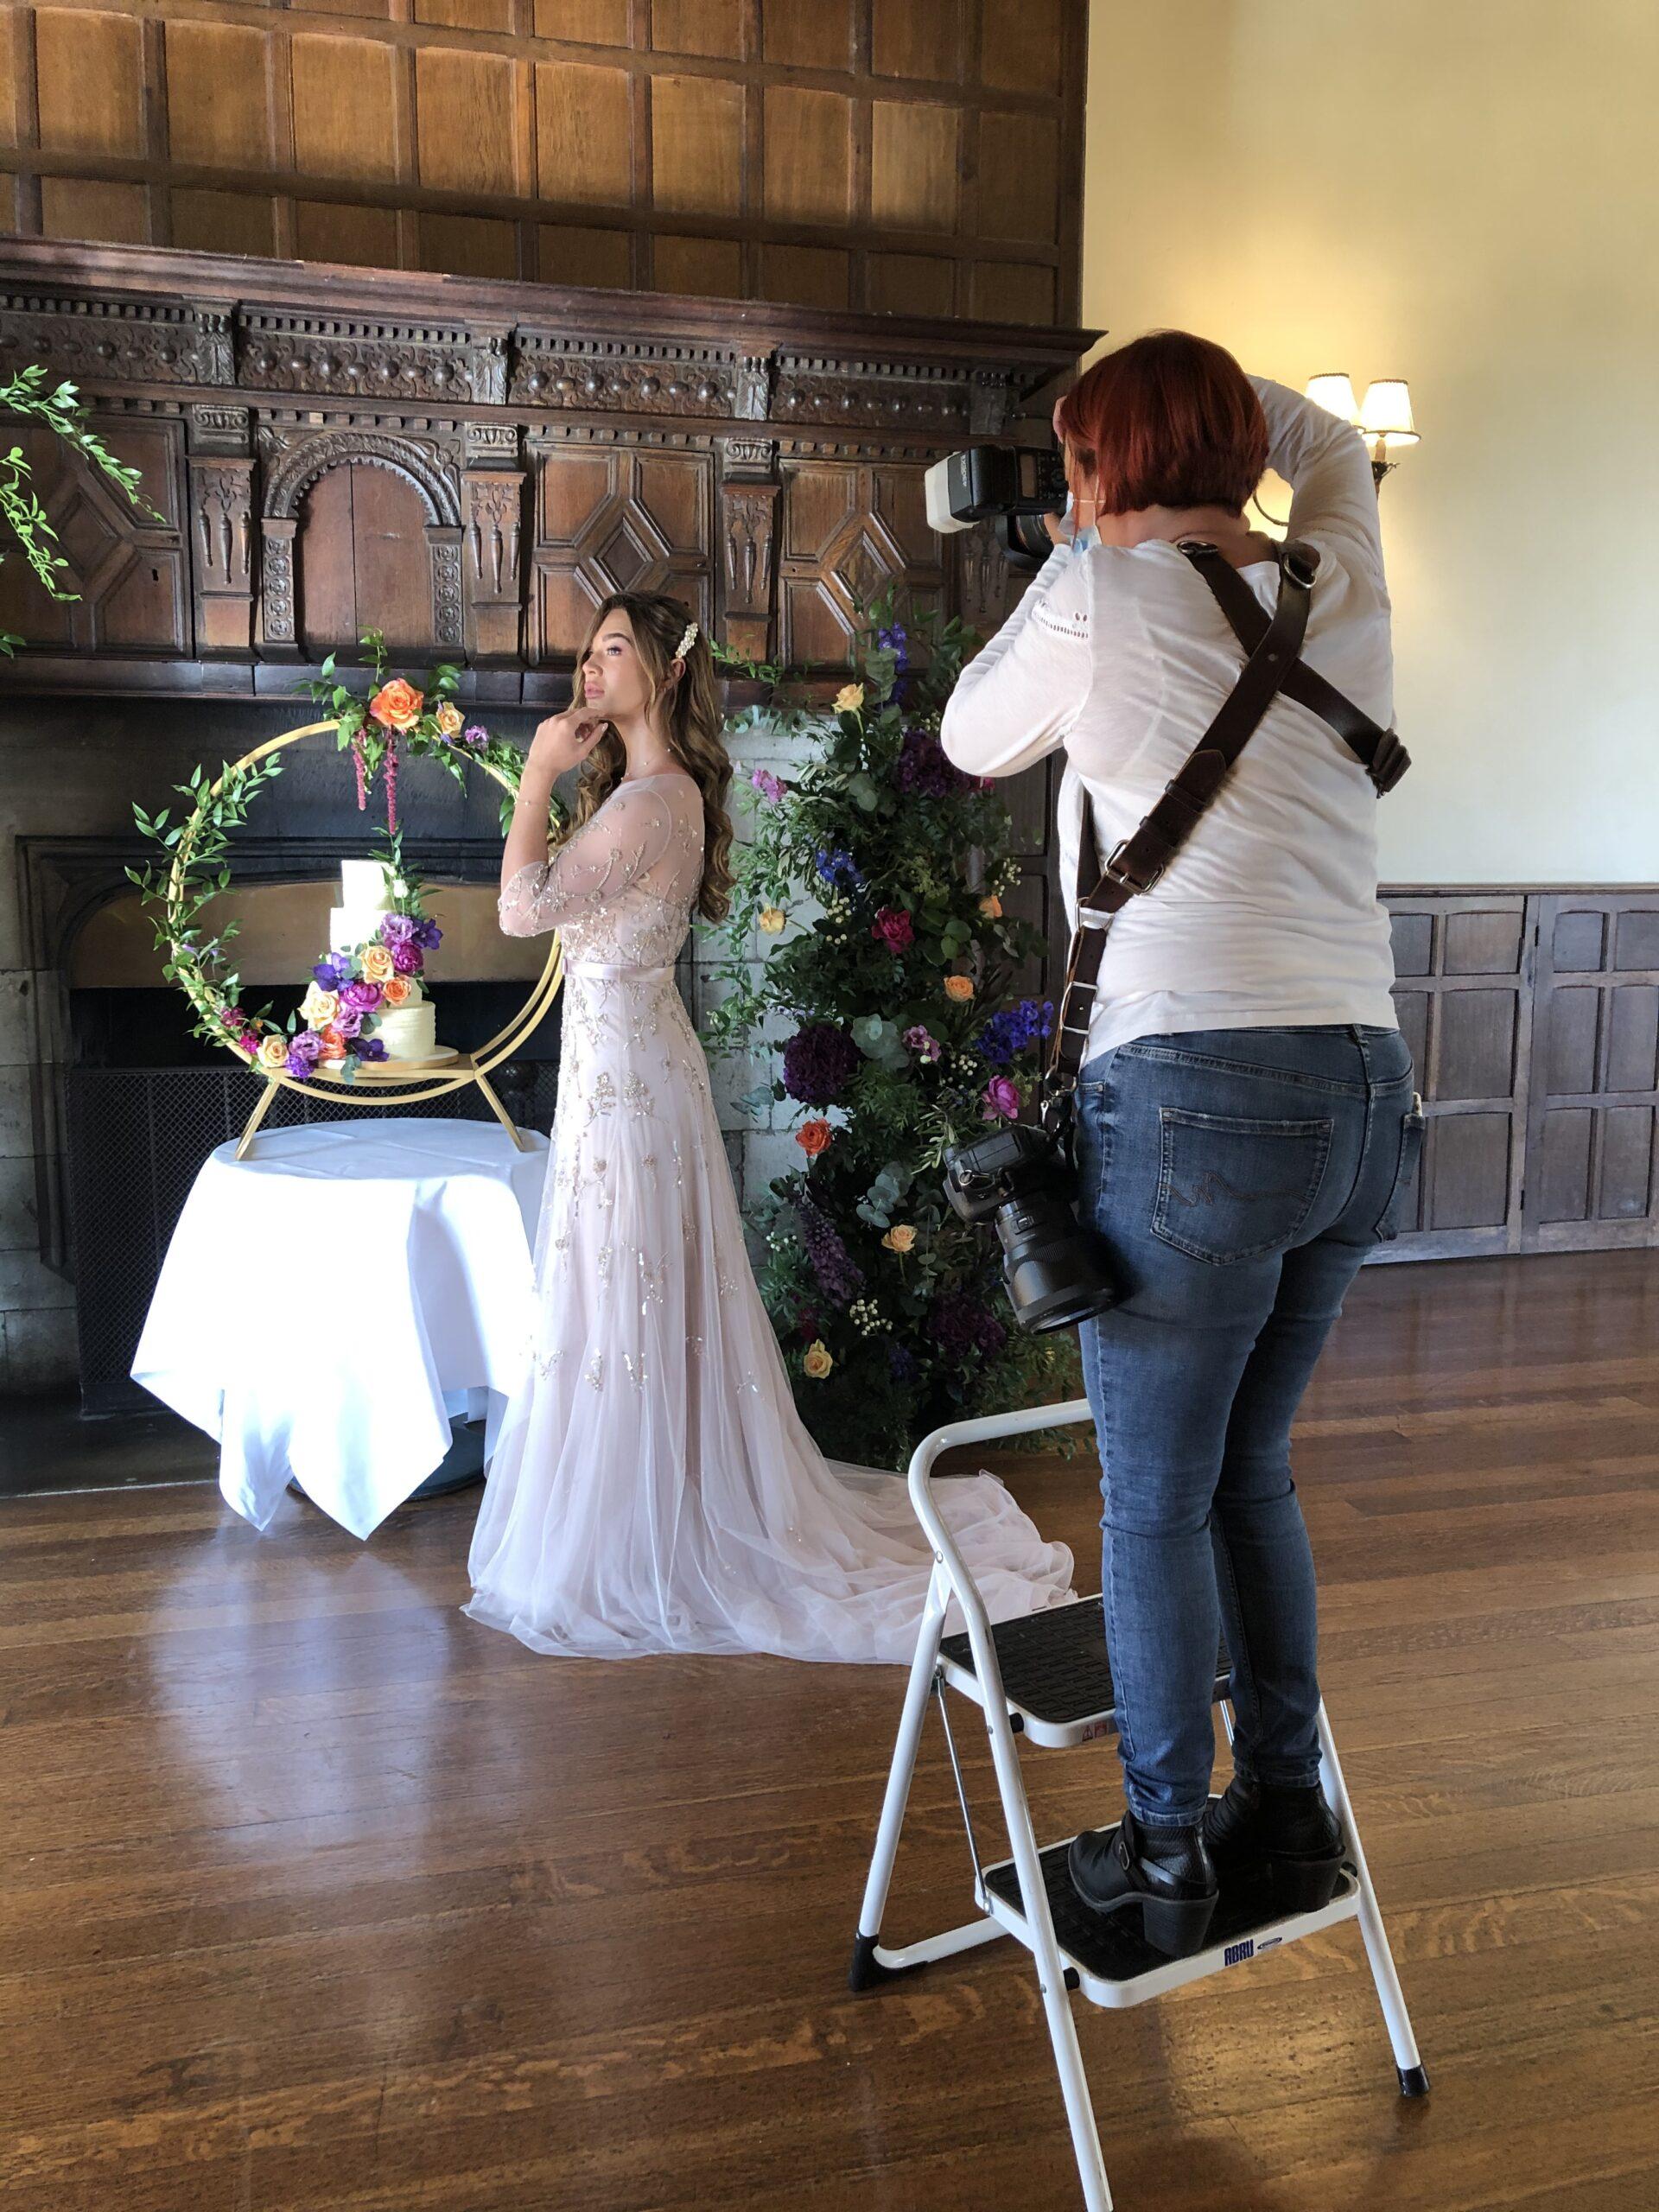 Wedding photographer, photo shoot